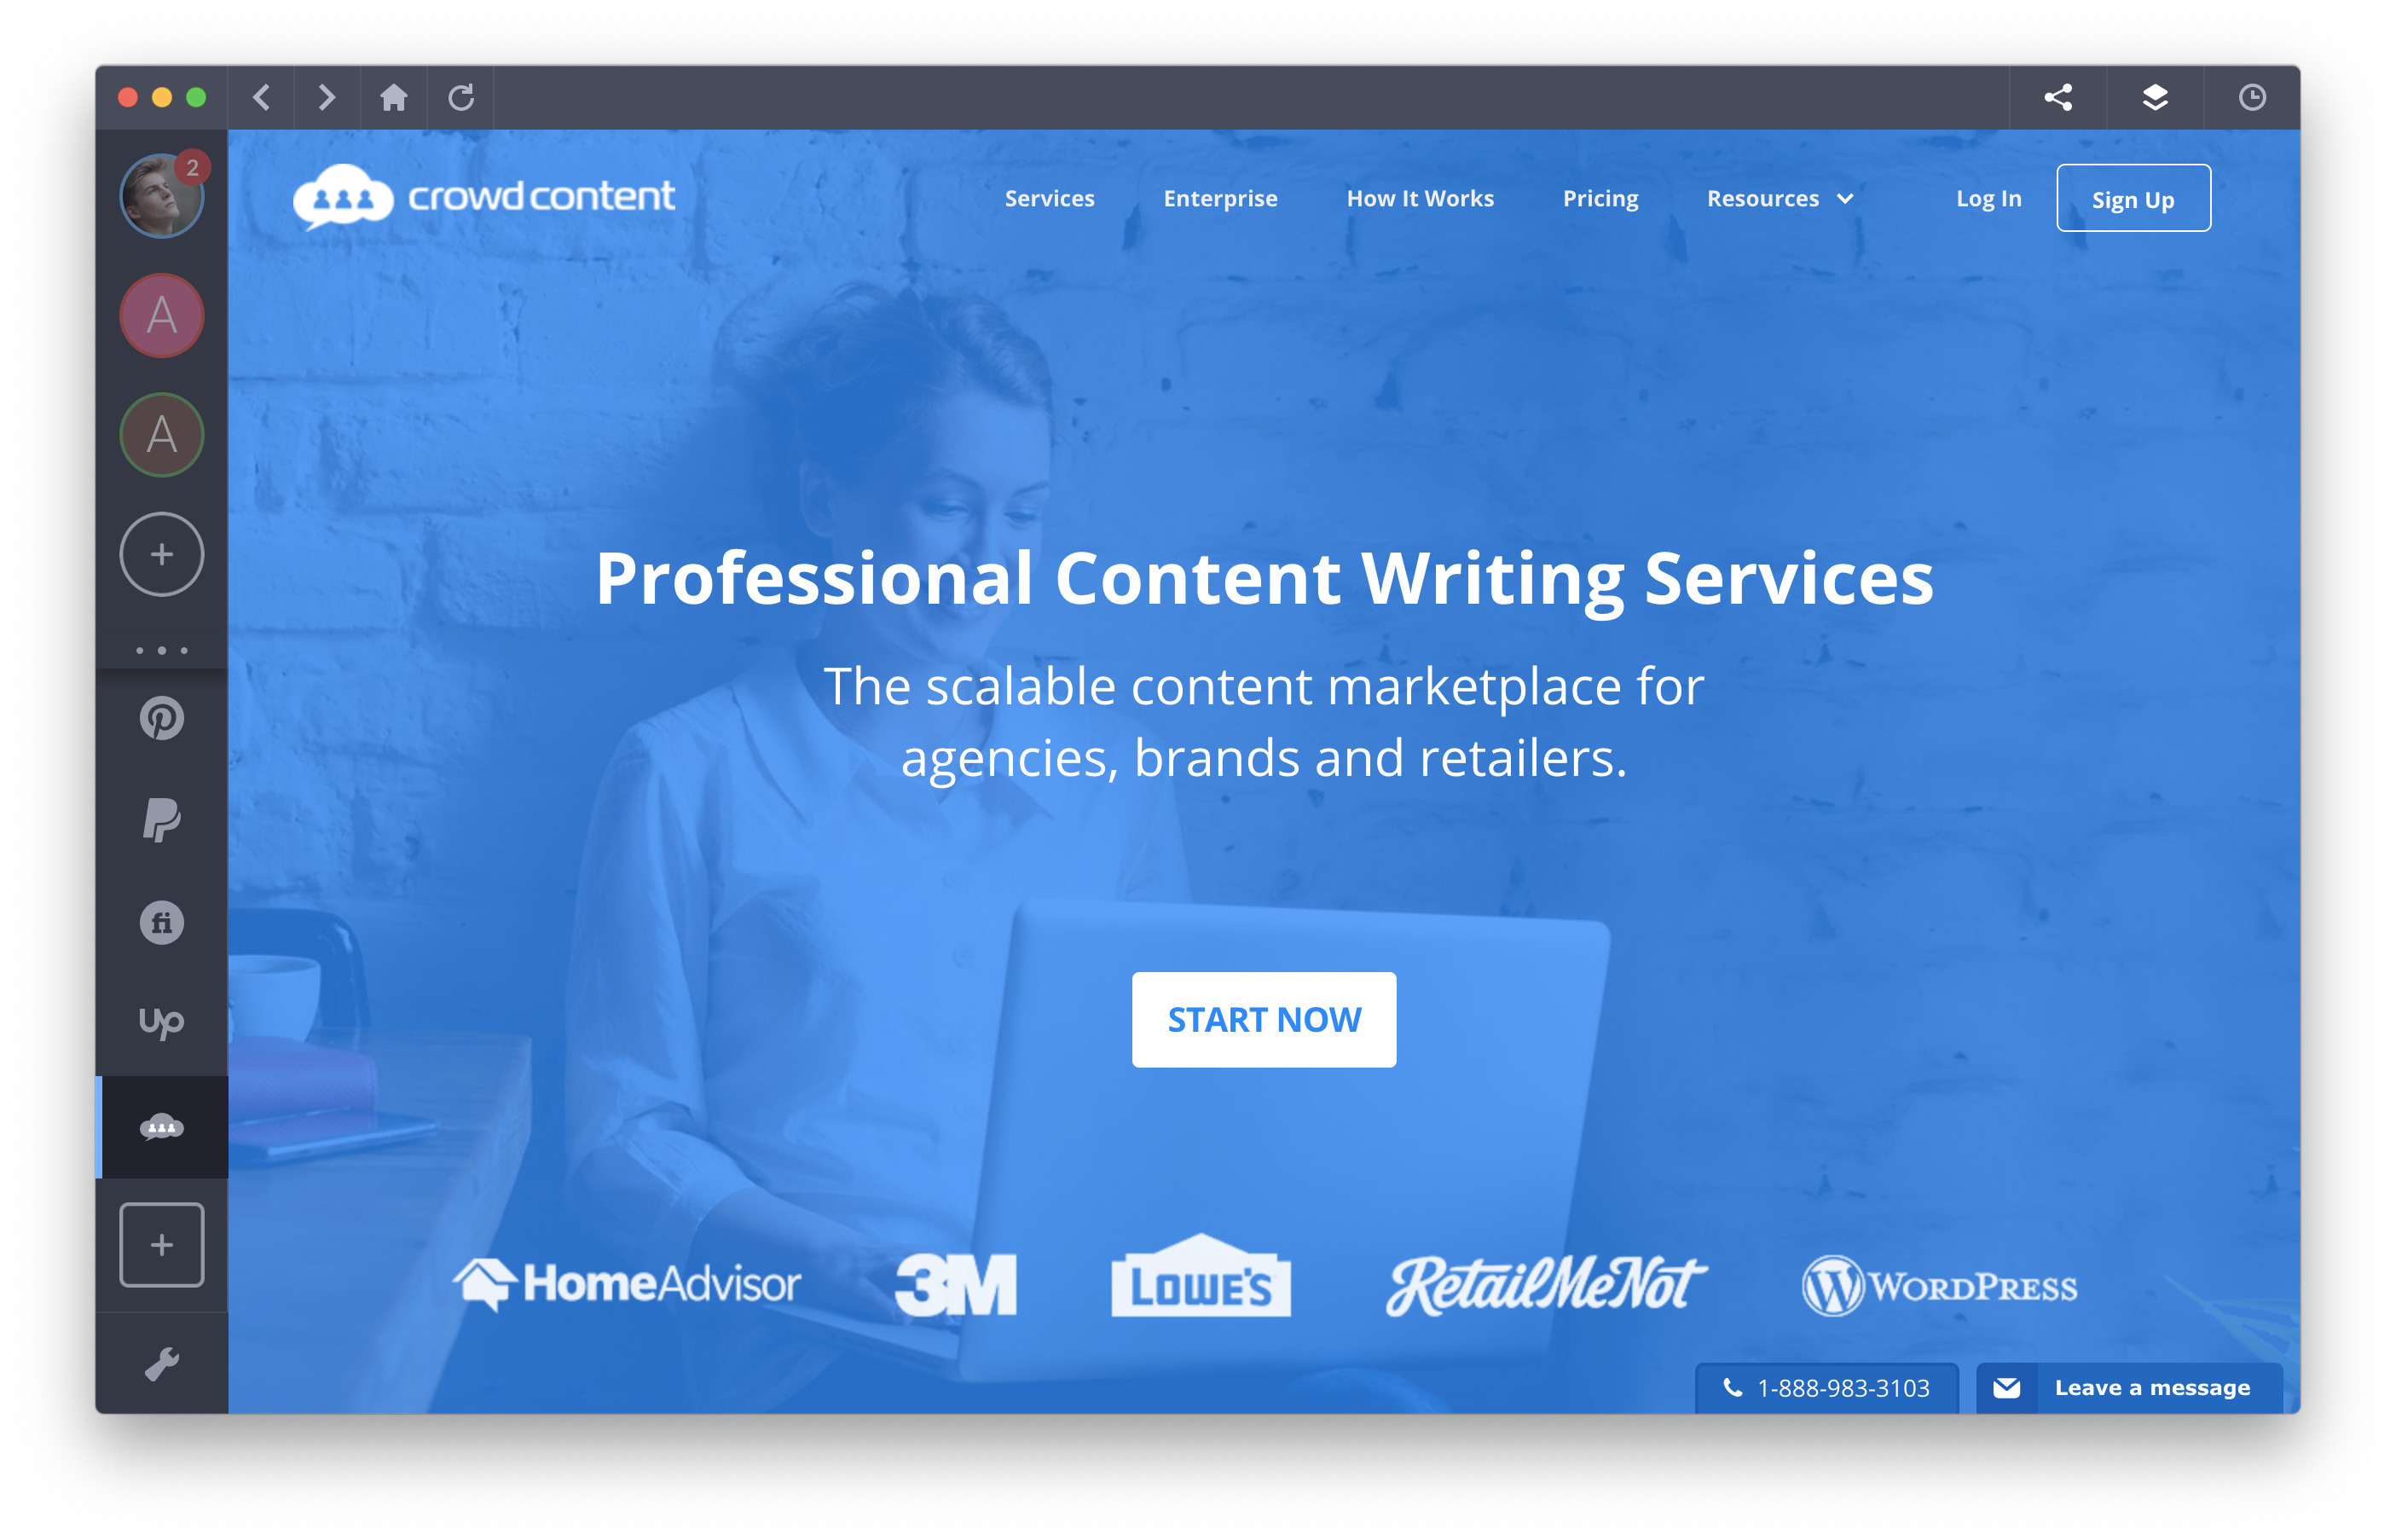 freelance platform - crowdcontent